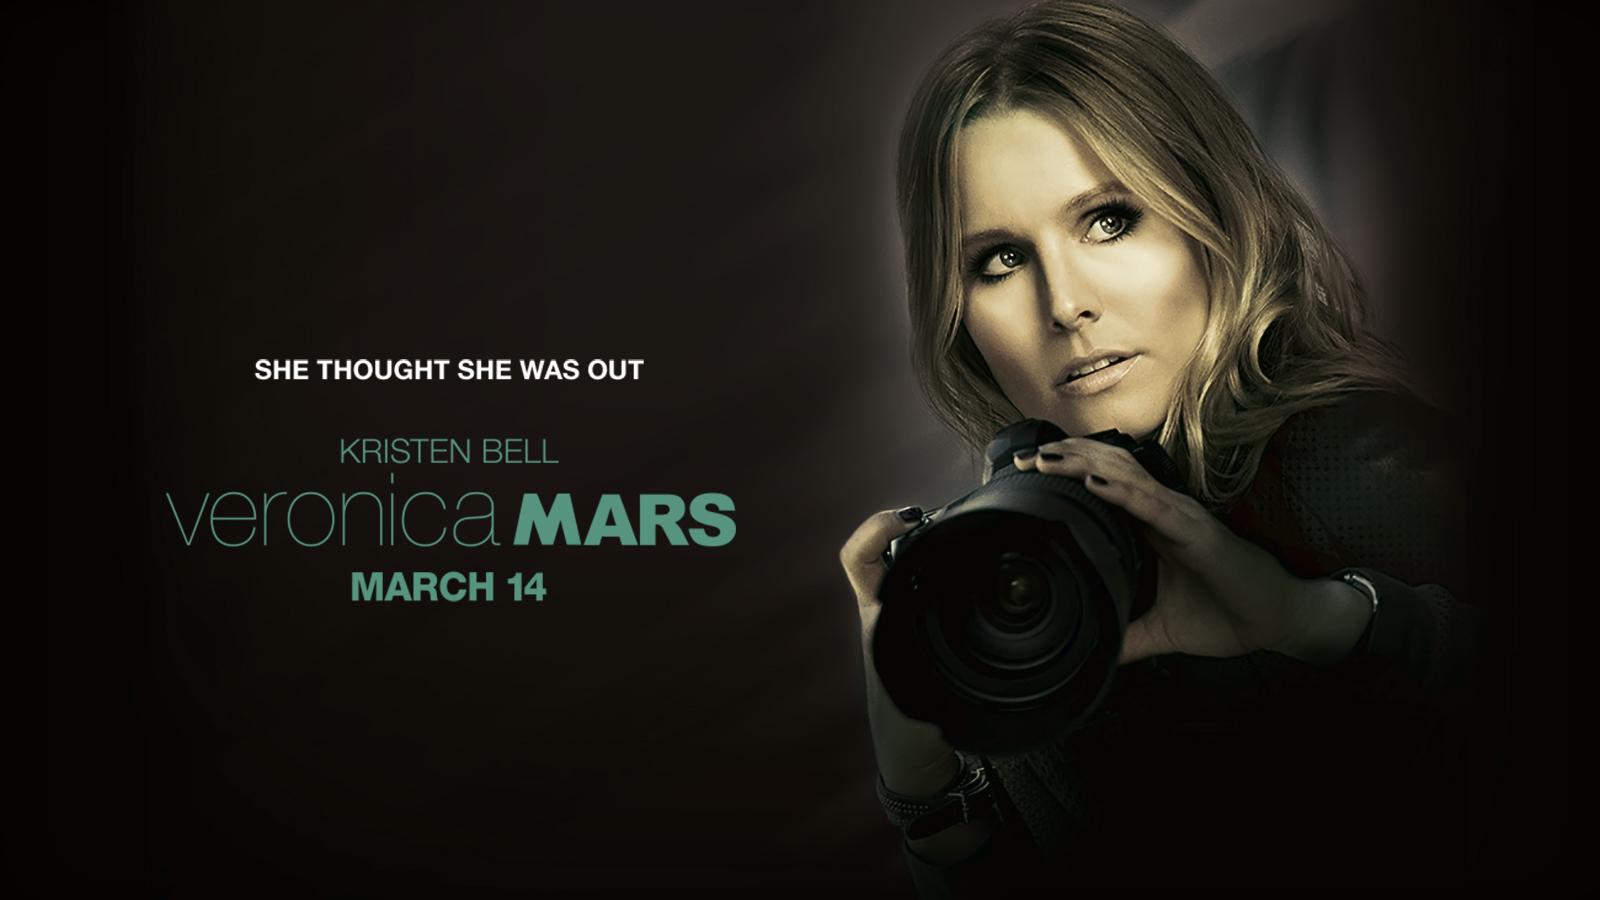 Veronica Mars (2014) Movie Poster